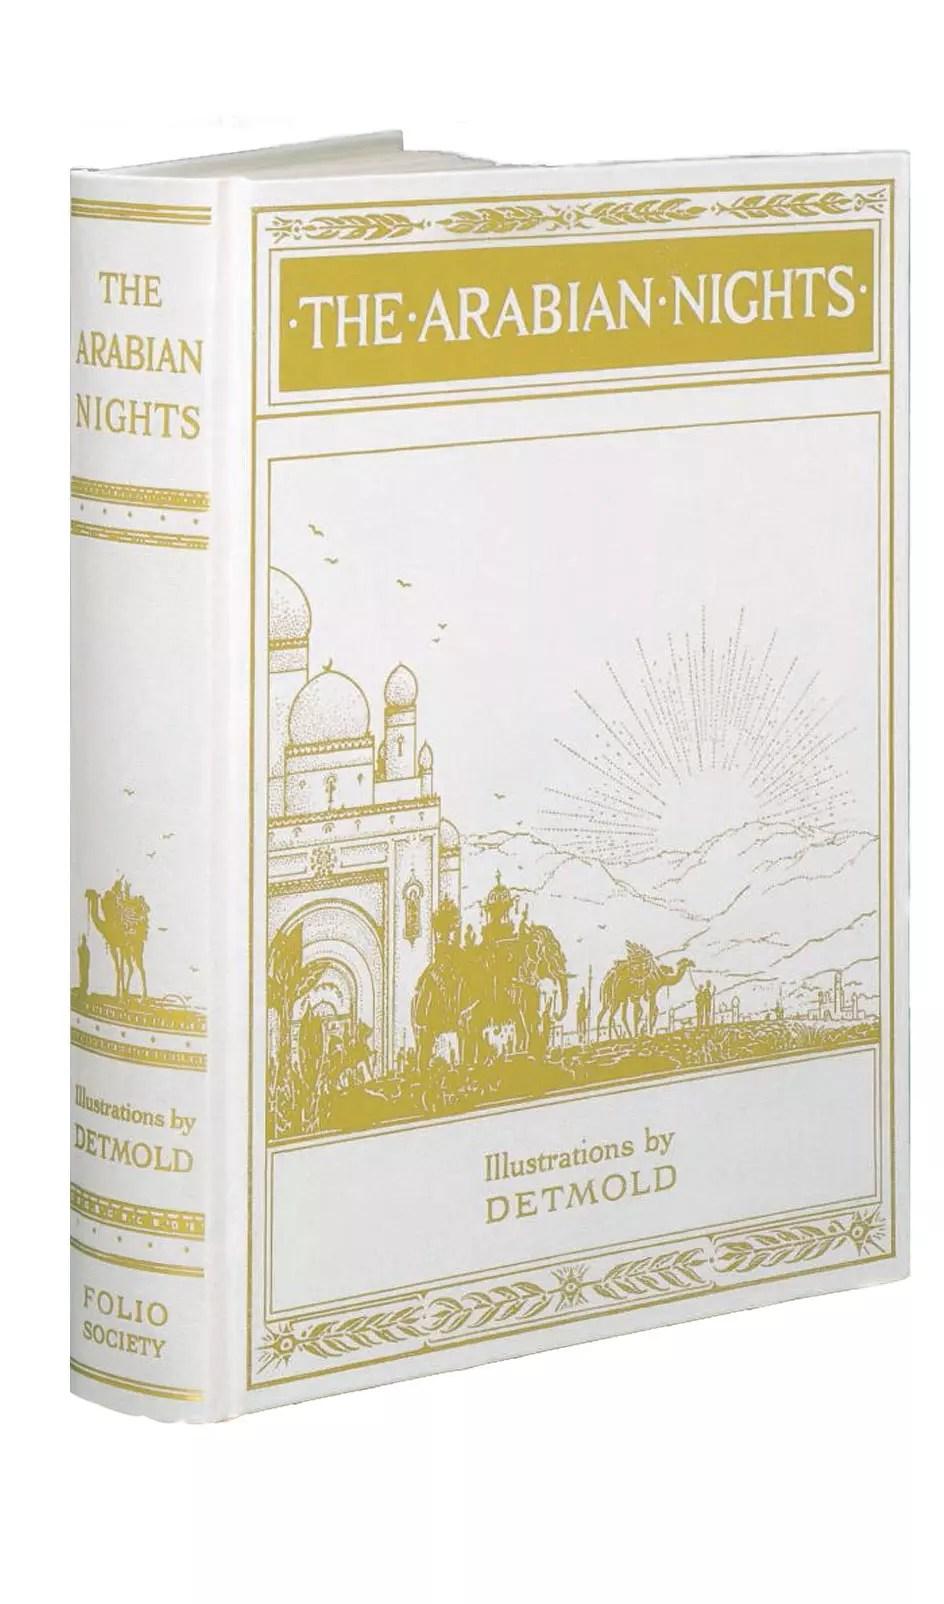 FS Arabian Nights | visit beautifulbooks.info for more...